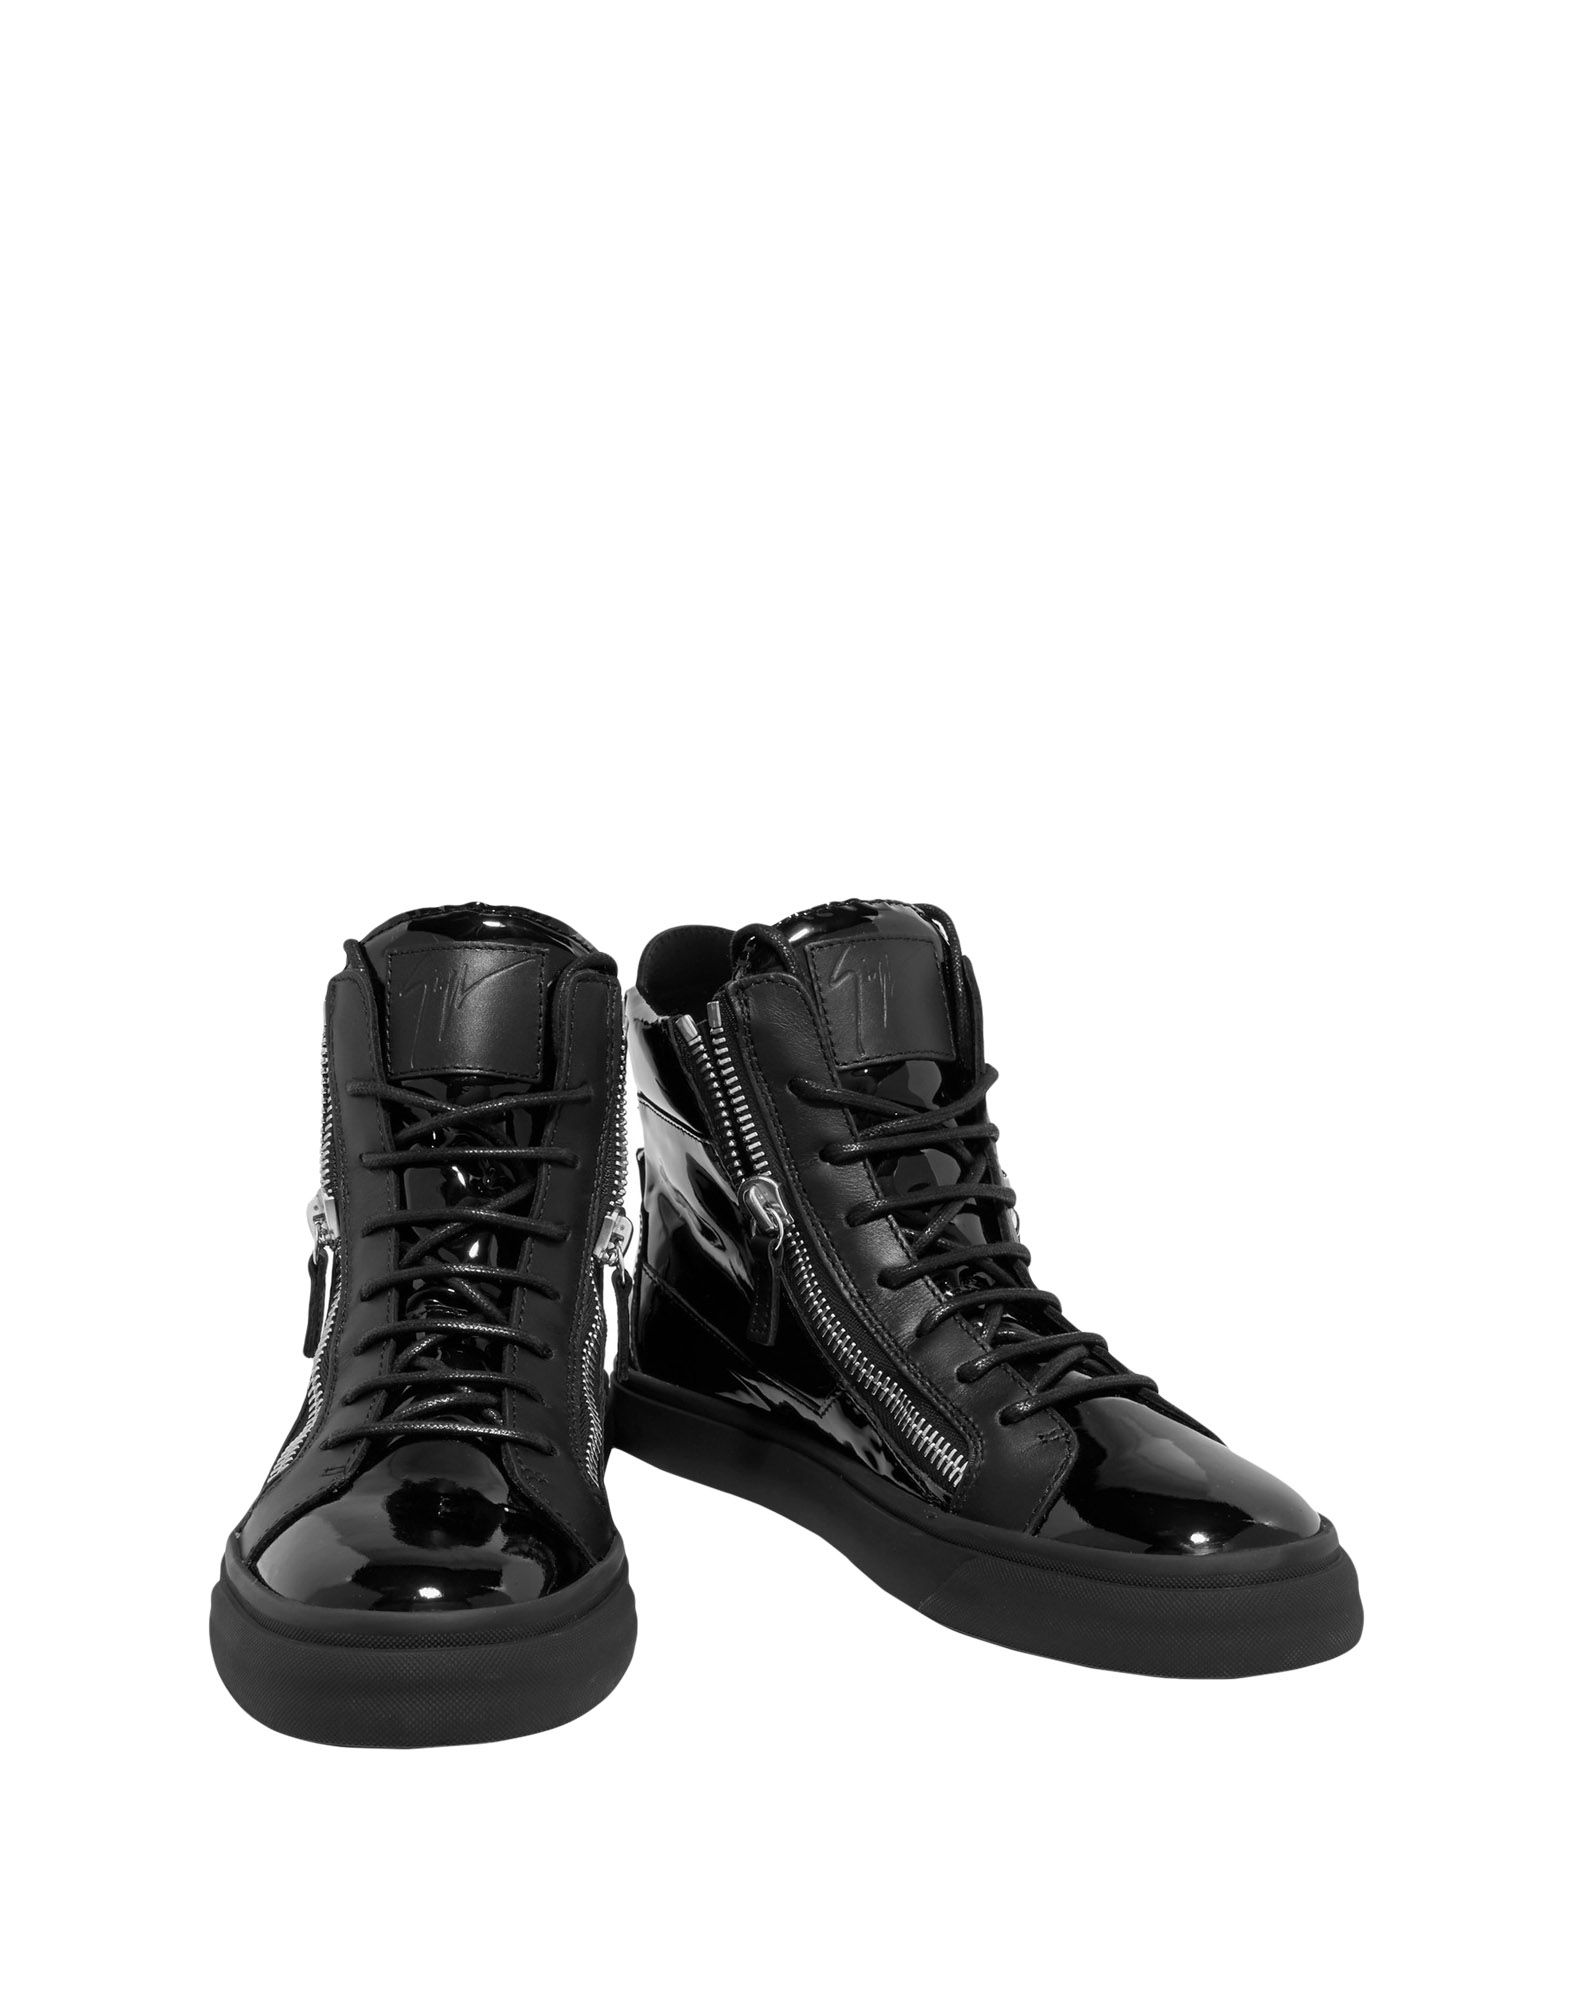 Giuseppe Zanotti Sneakers 11514504MH Damen  11514504MH Sneakers Beliebte Schuhe bf5ae2